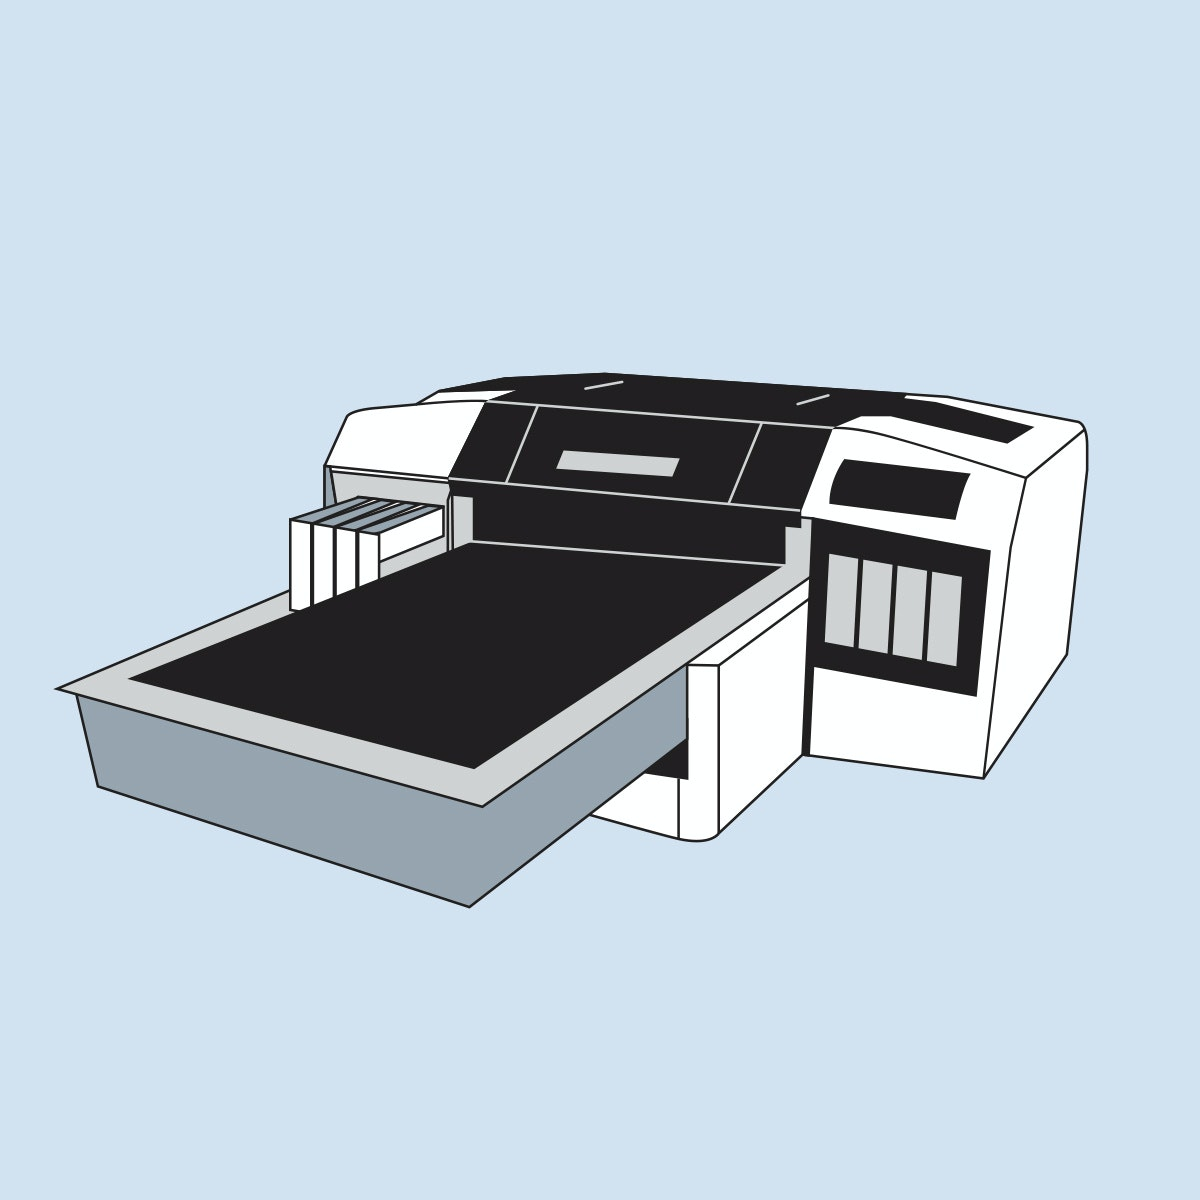 Printer design